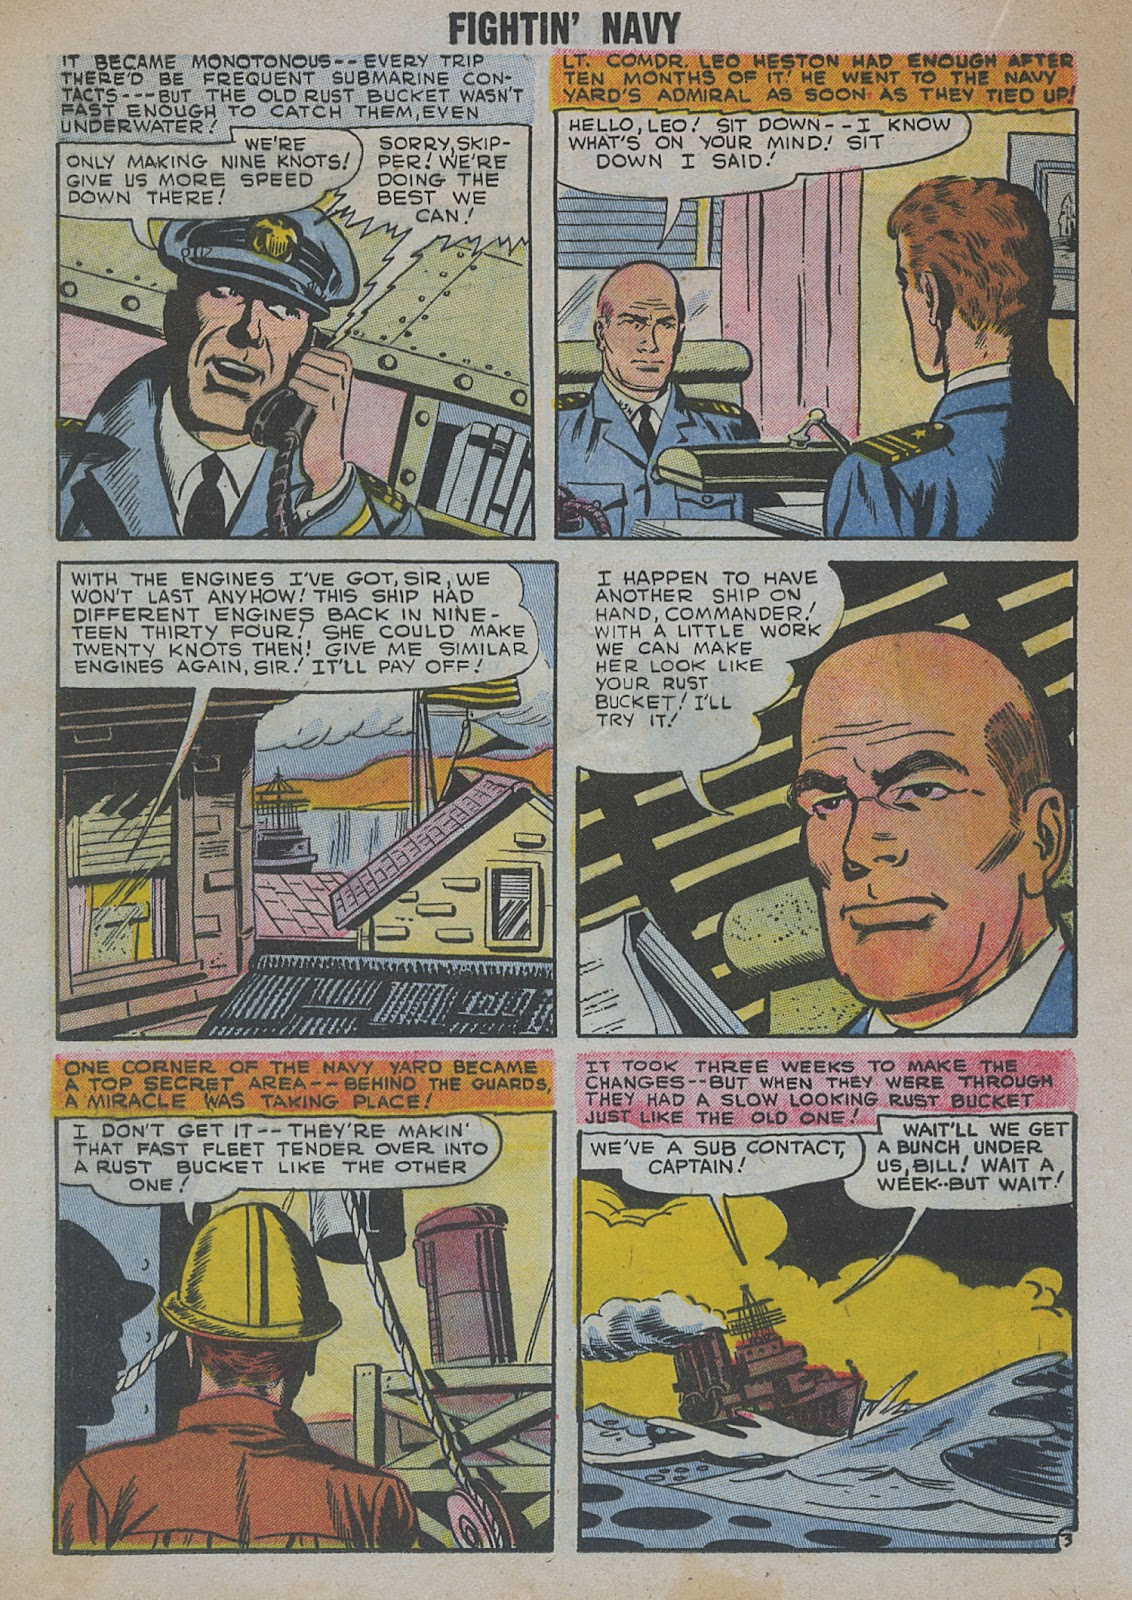 Read online Fightin' Navy comic -  Issue #82 - 36